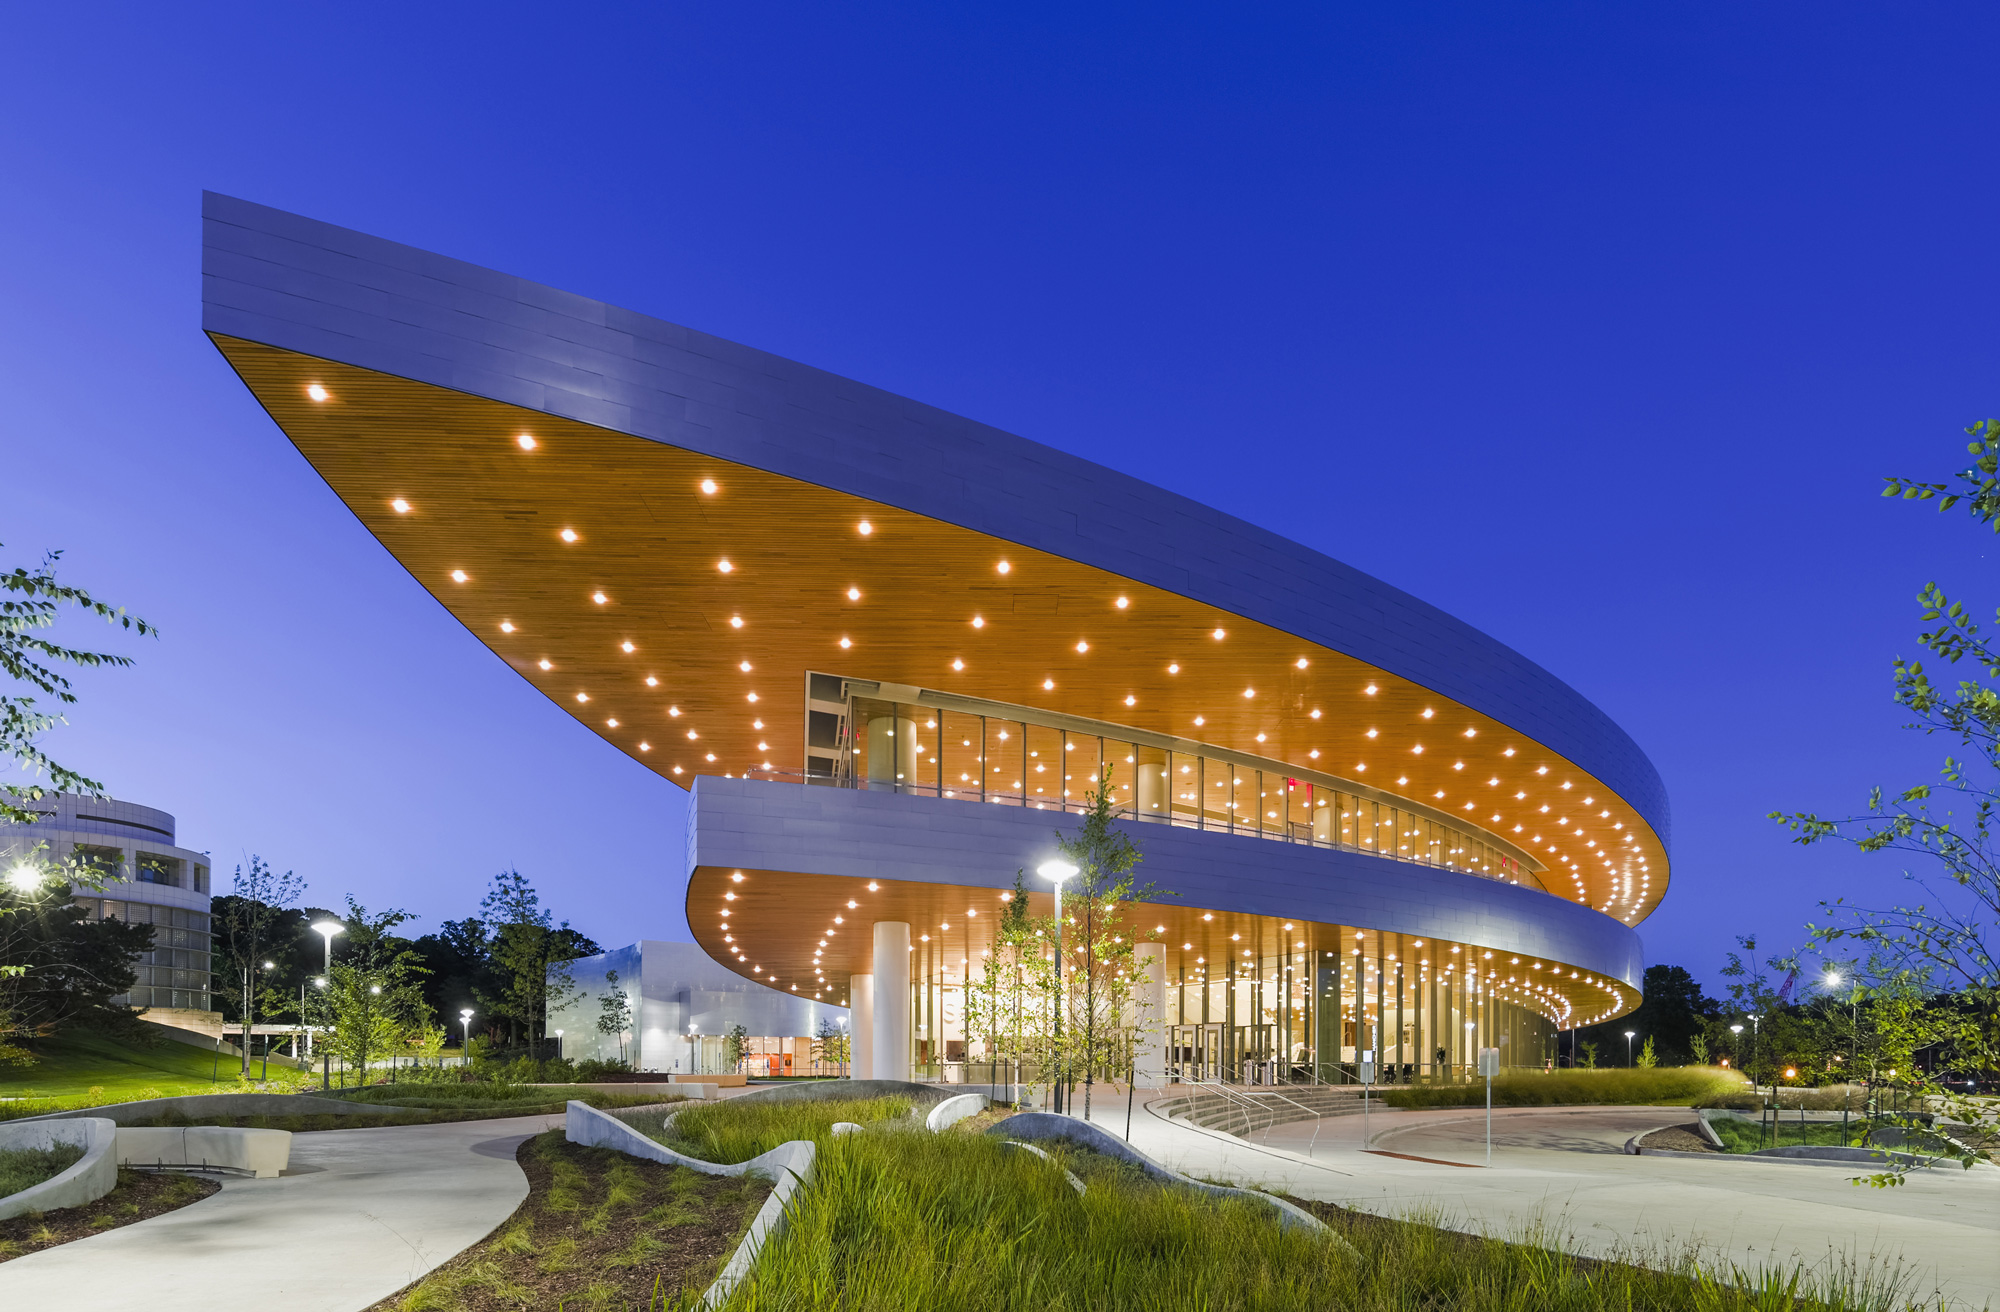 Hancher Building, Pelli Clarke Pelli Architects Jeff Goldberg/ESTO